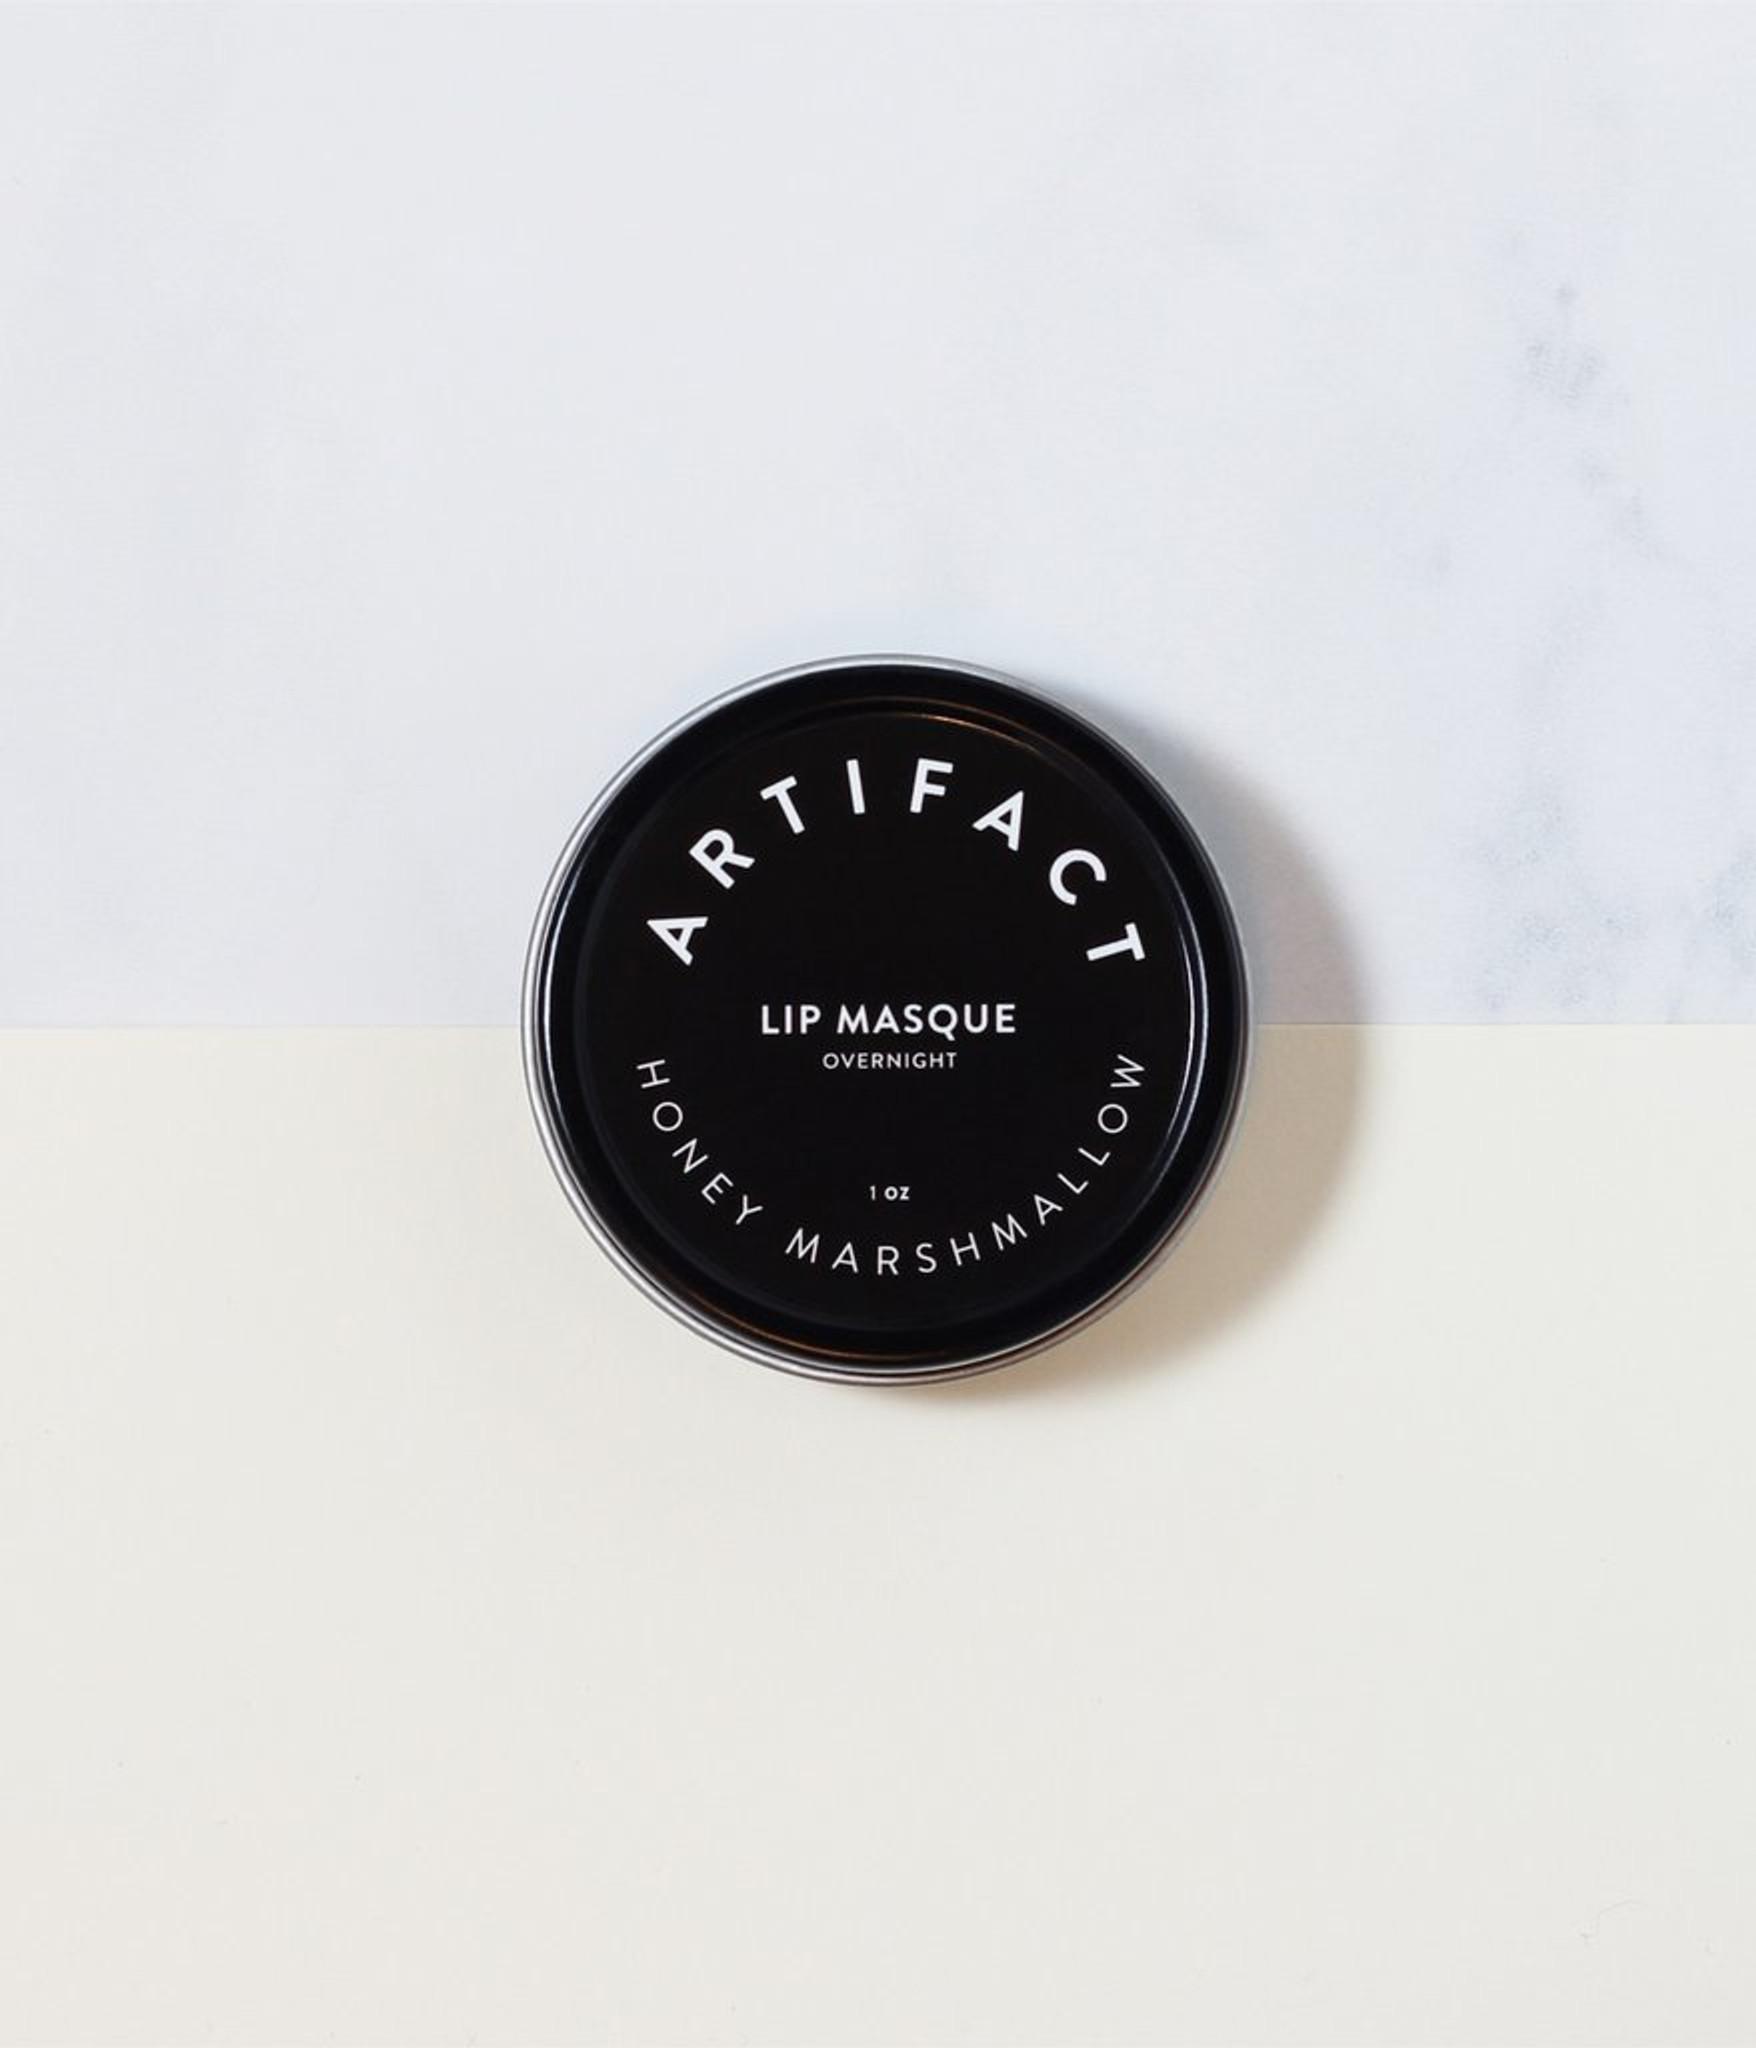 Honey Marshmallow Lip Masque